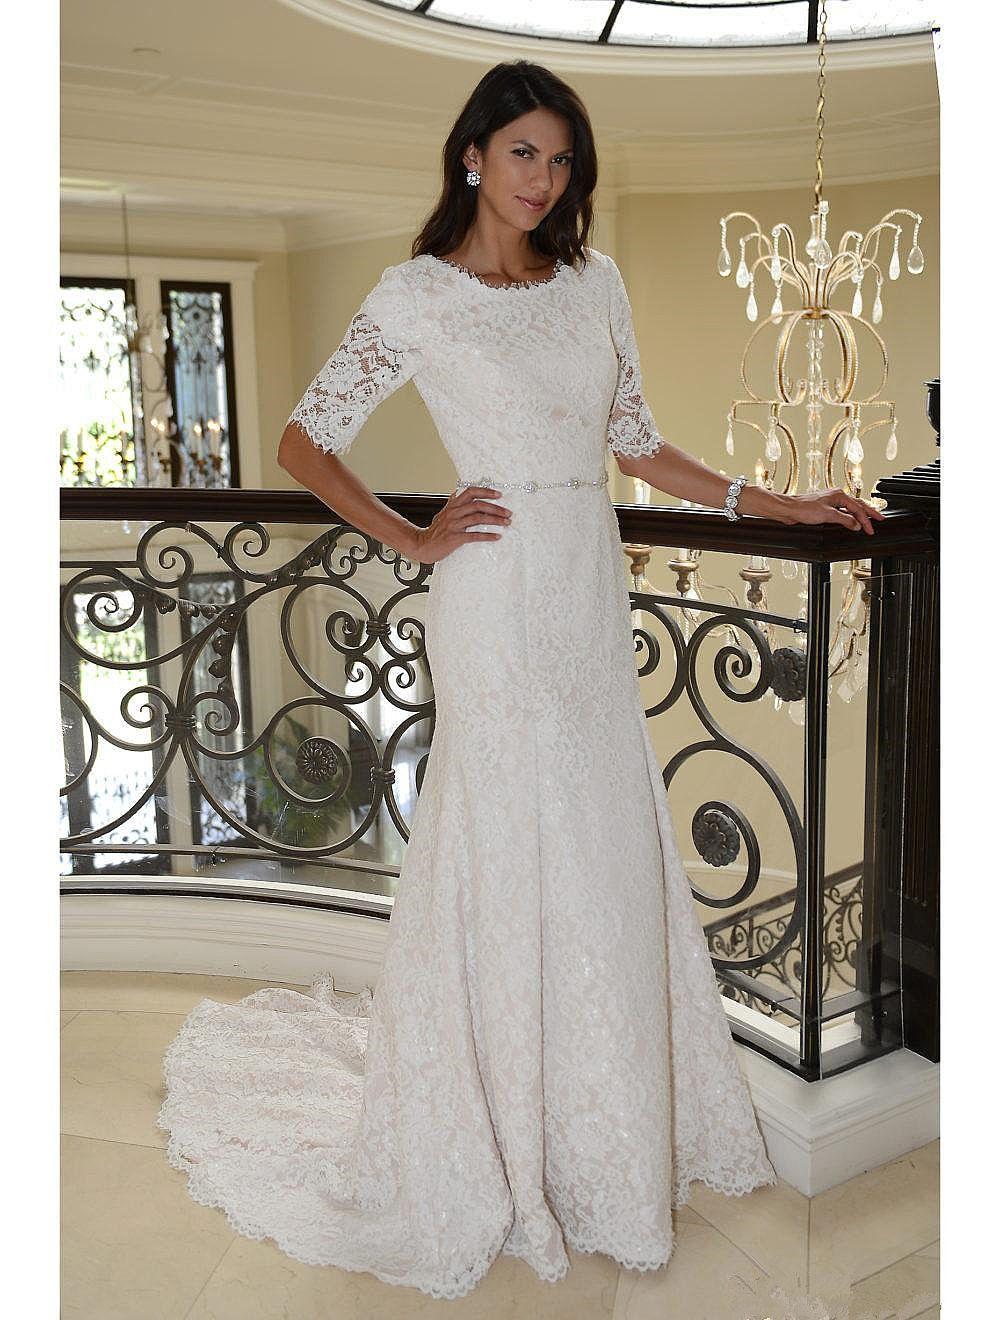 2018 Vintage Lace Wedding Dresses With Half Sleeves